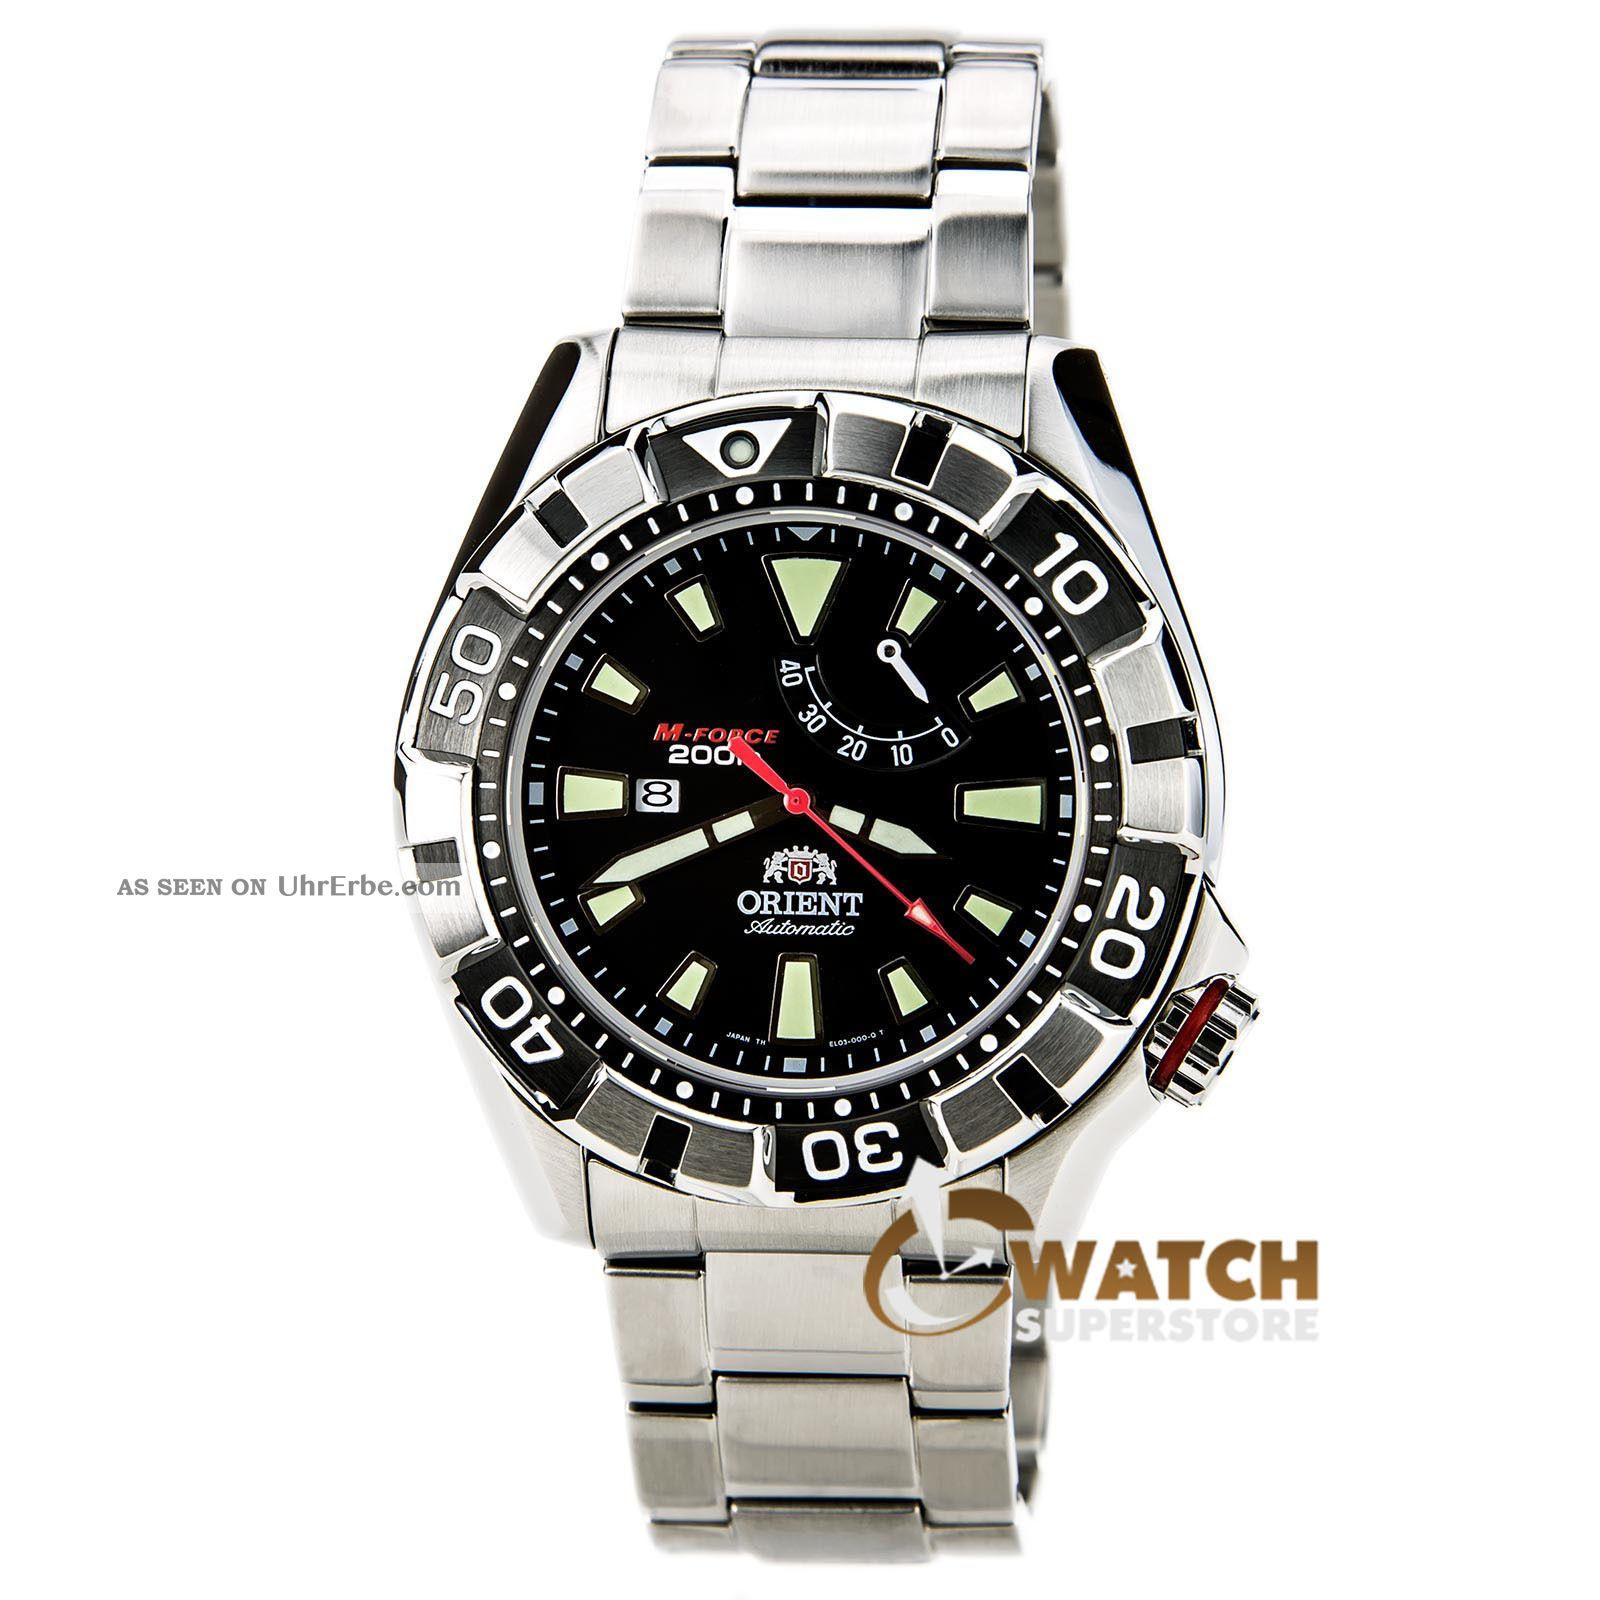 Orient Sel03001b Herrenuhr Automatik Uhr Armbanduhr Armbanduhren Bild